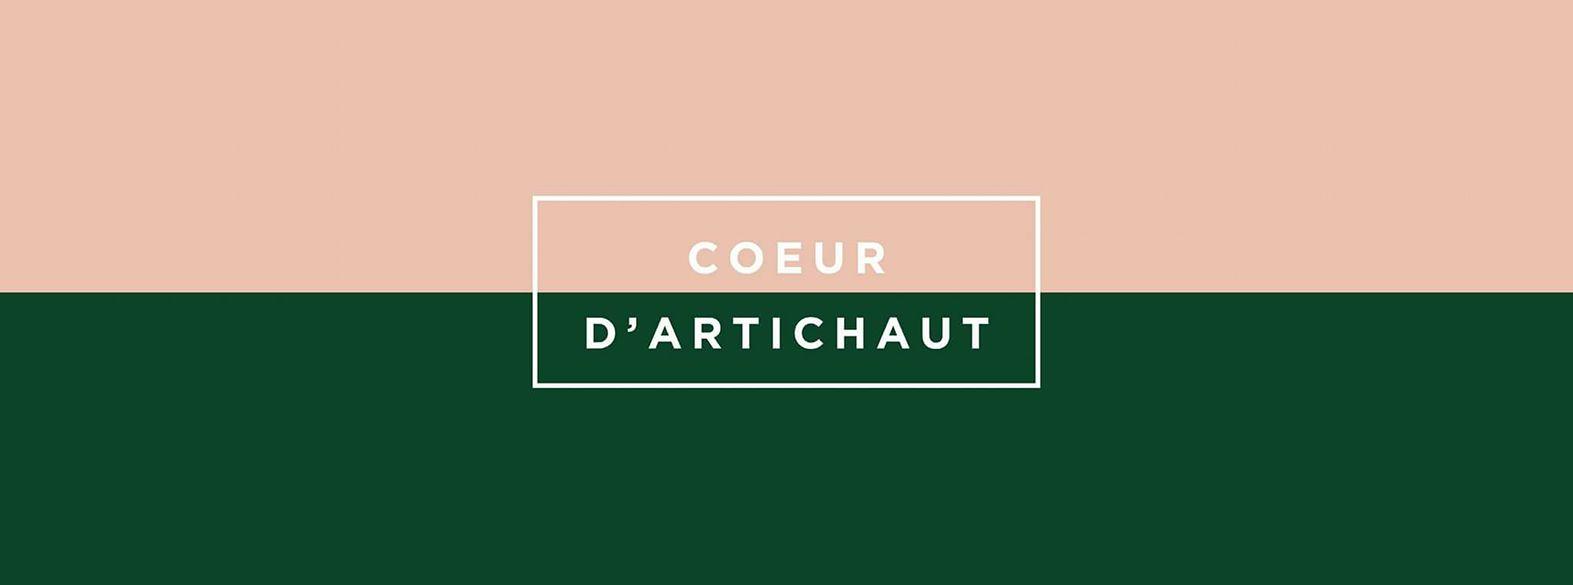 coeur-dartichaut-avignon